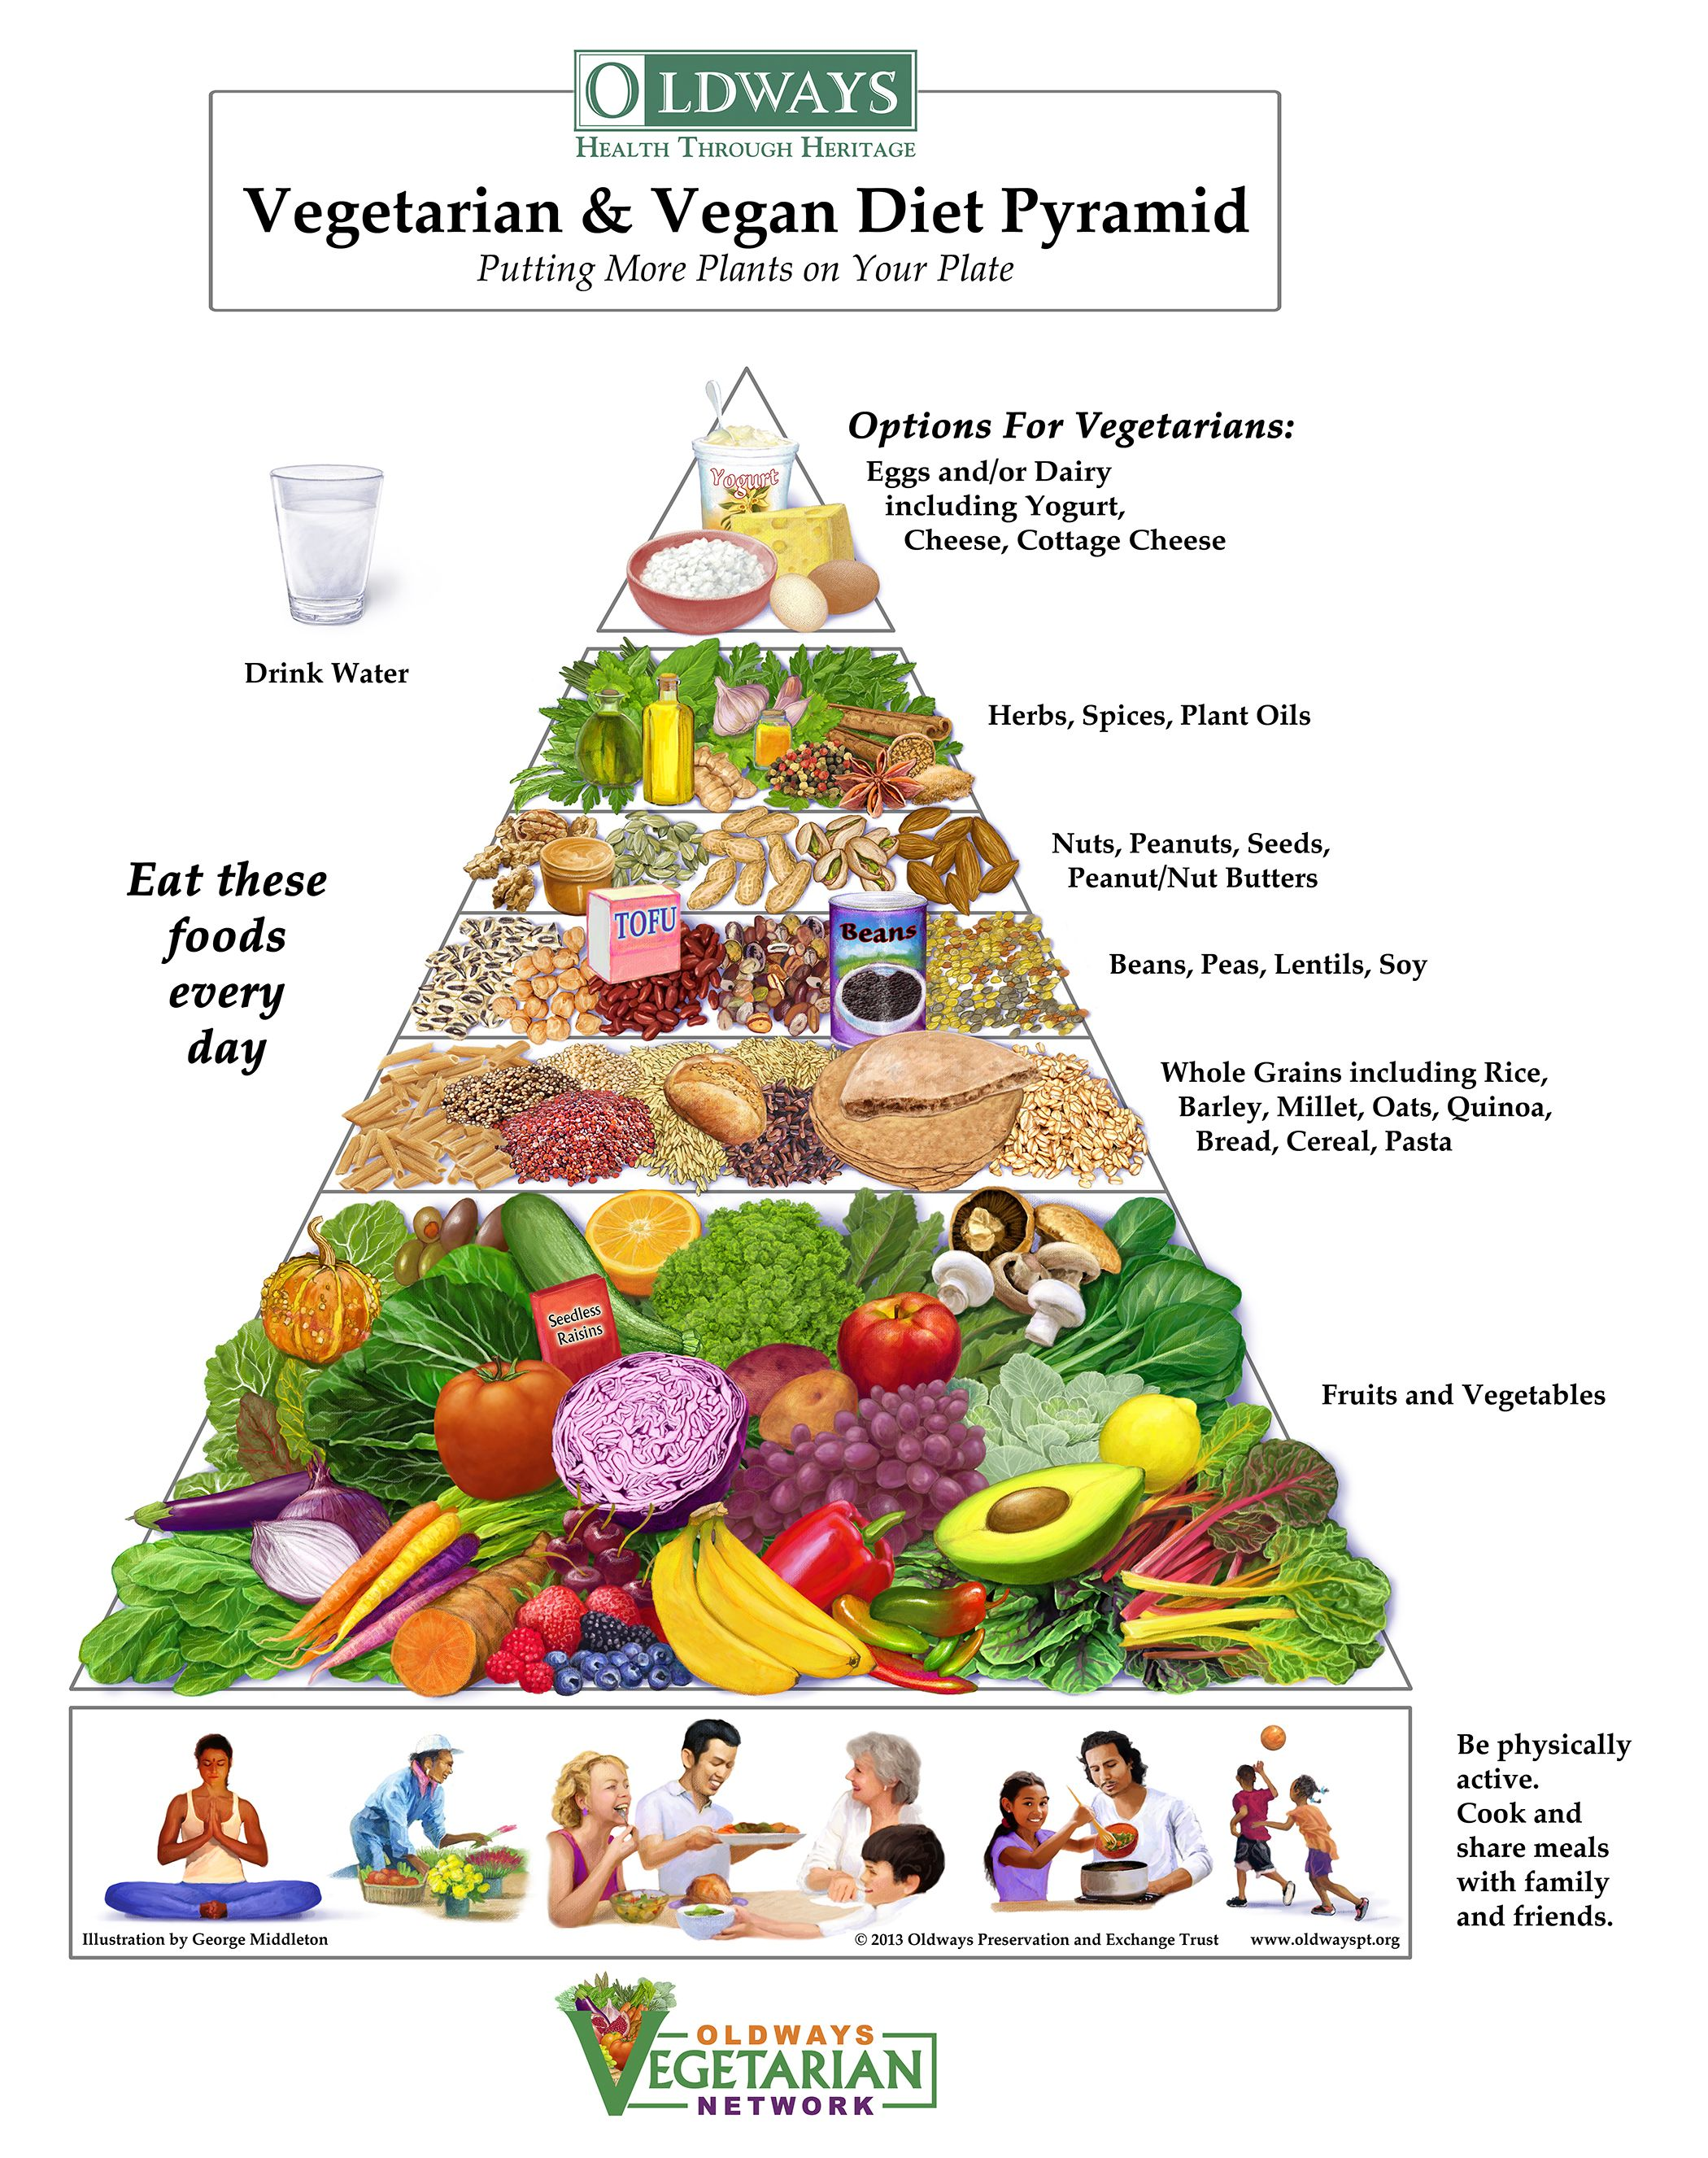 Vegan And Vegan Diet Pyramid According To Oldways Vegetarian Network Vegan Food Pyramid Vegetarian Food Pyramid Vegan Nutrition